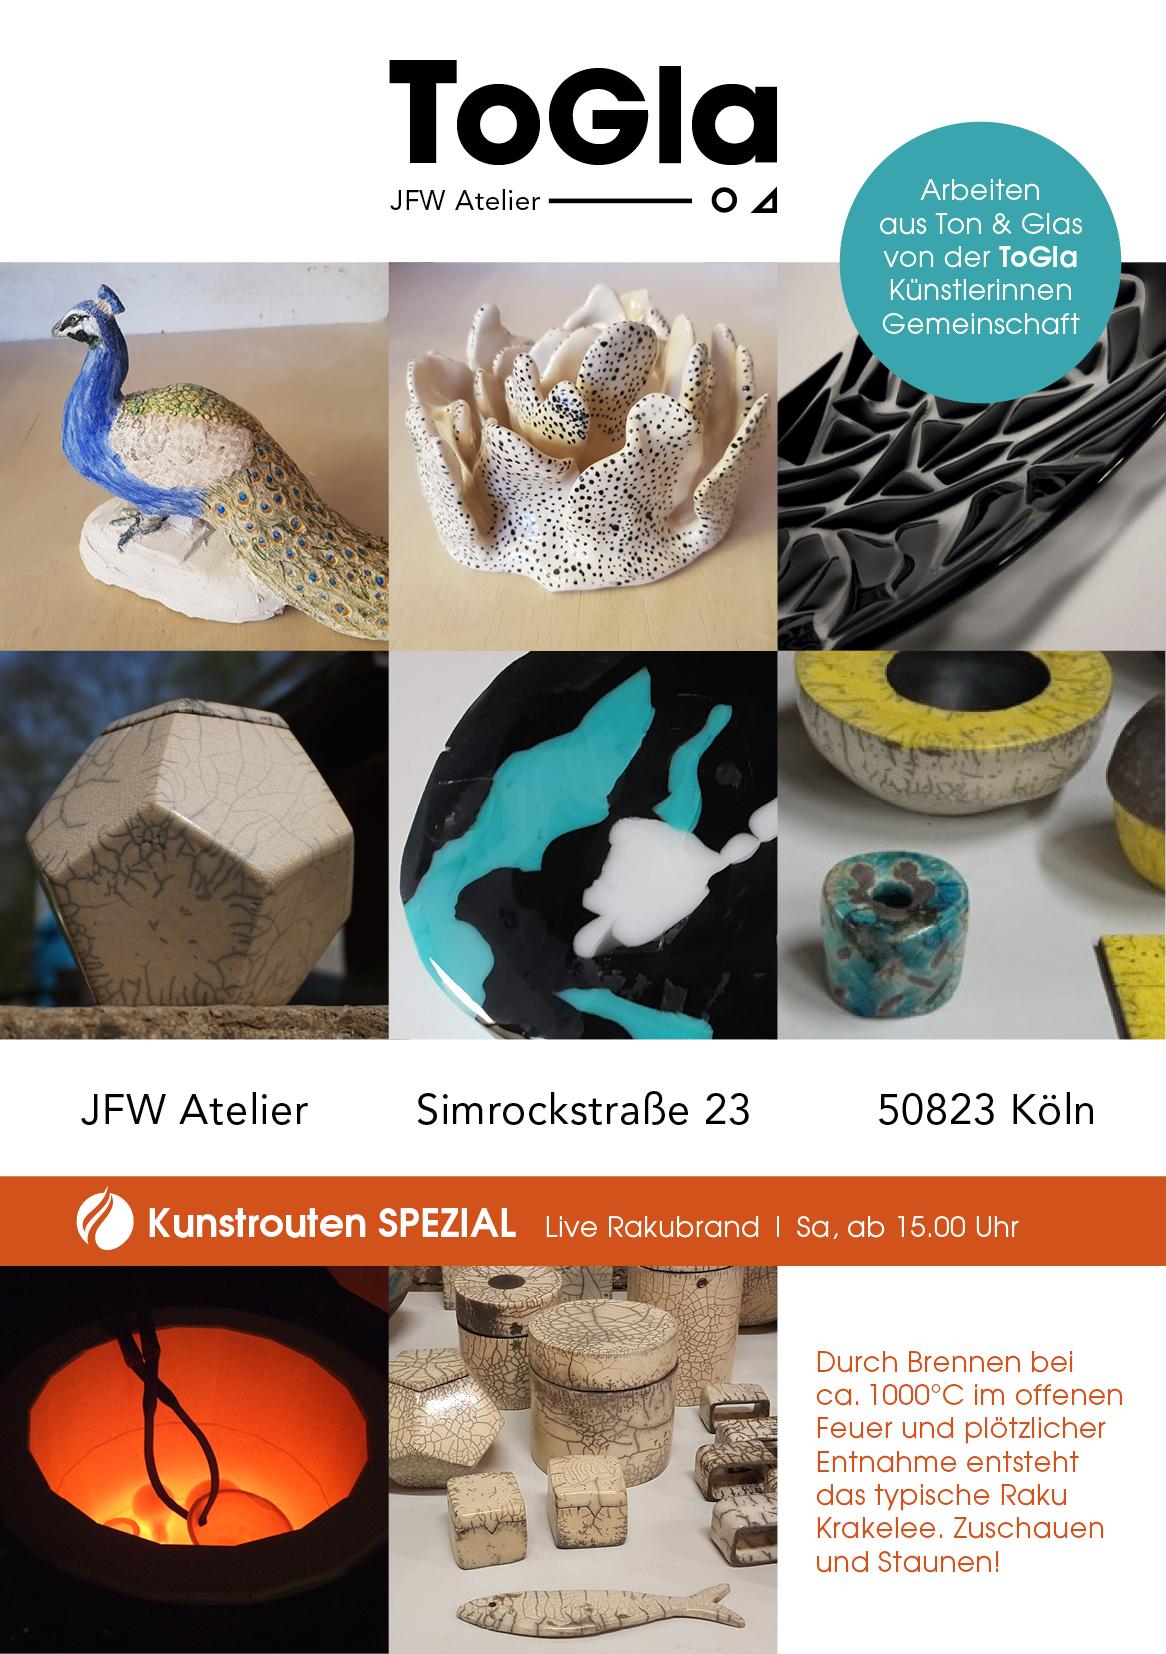 081219_KunstrouteEhrenfeld_ToGla_DINA5_WEB_RGB